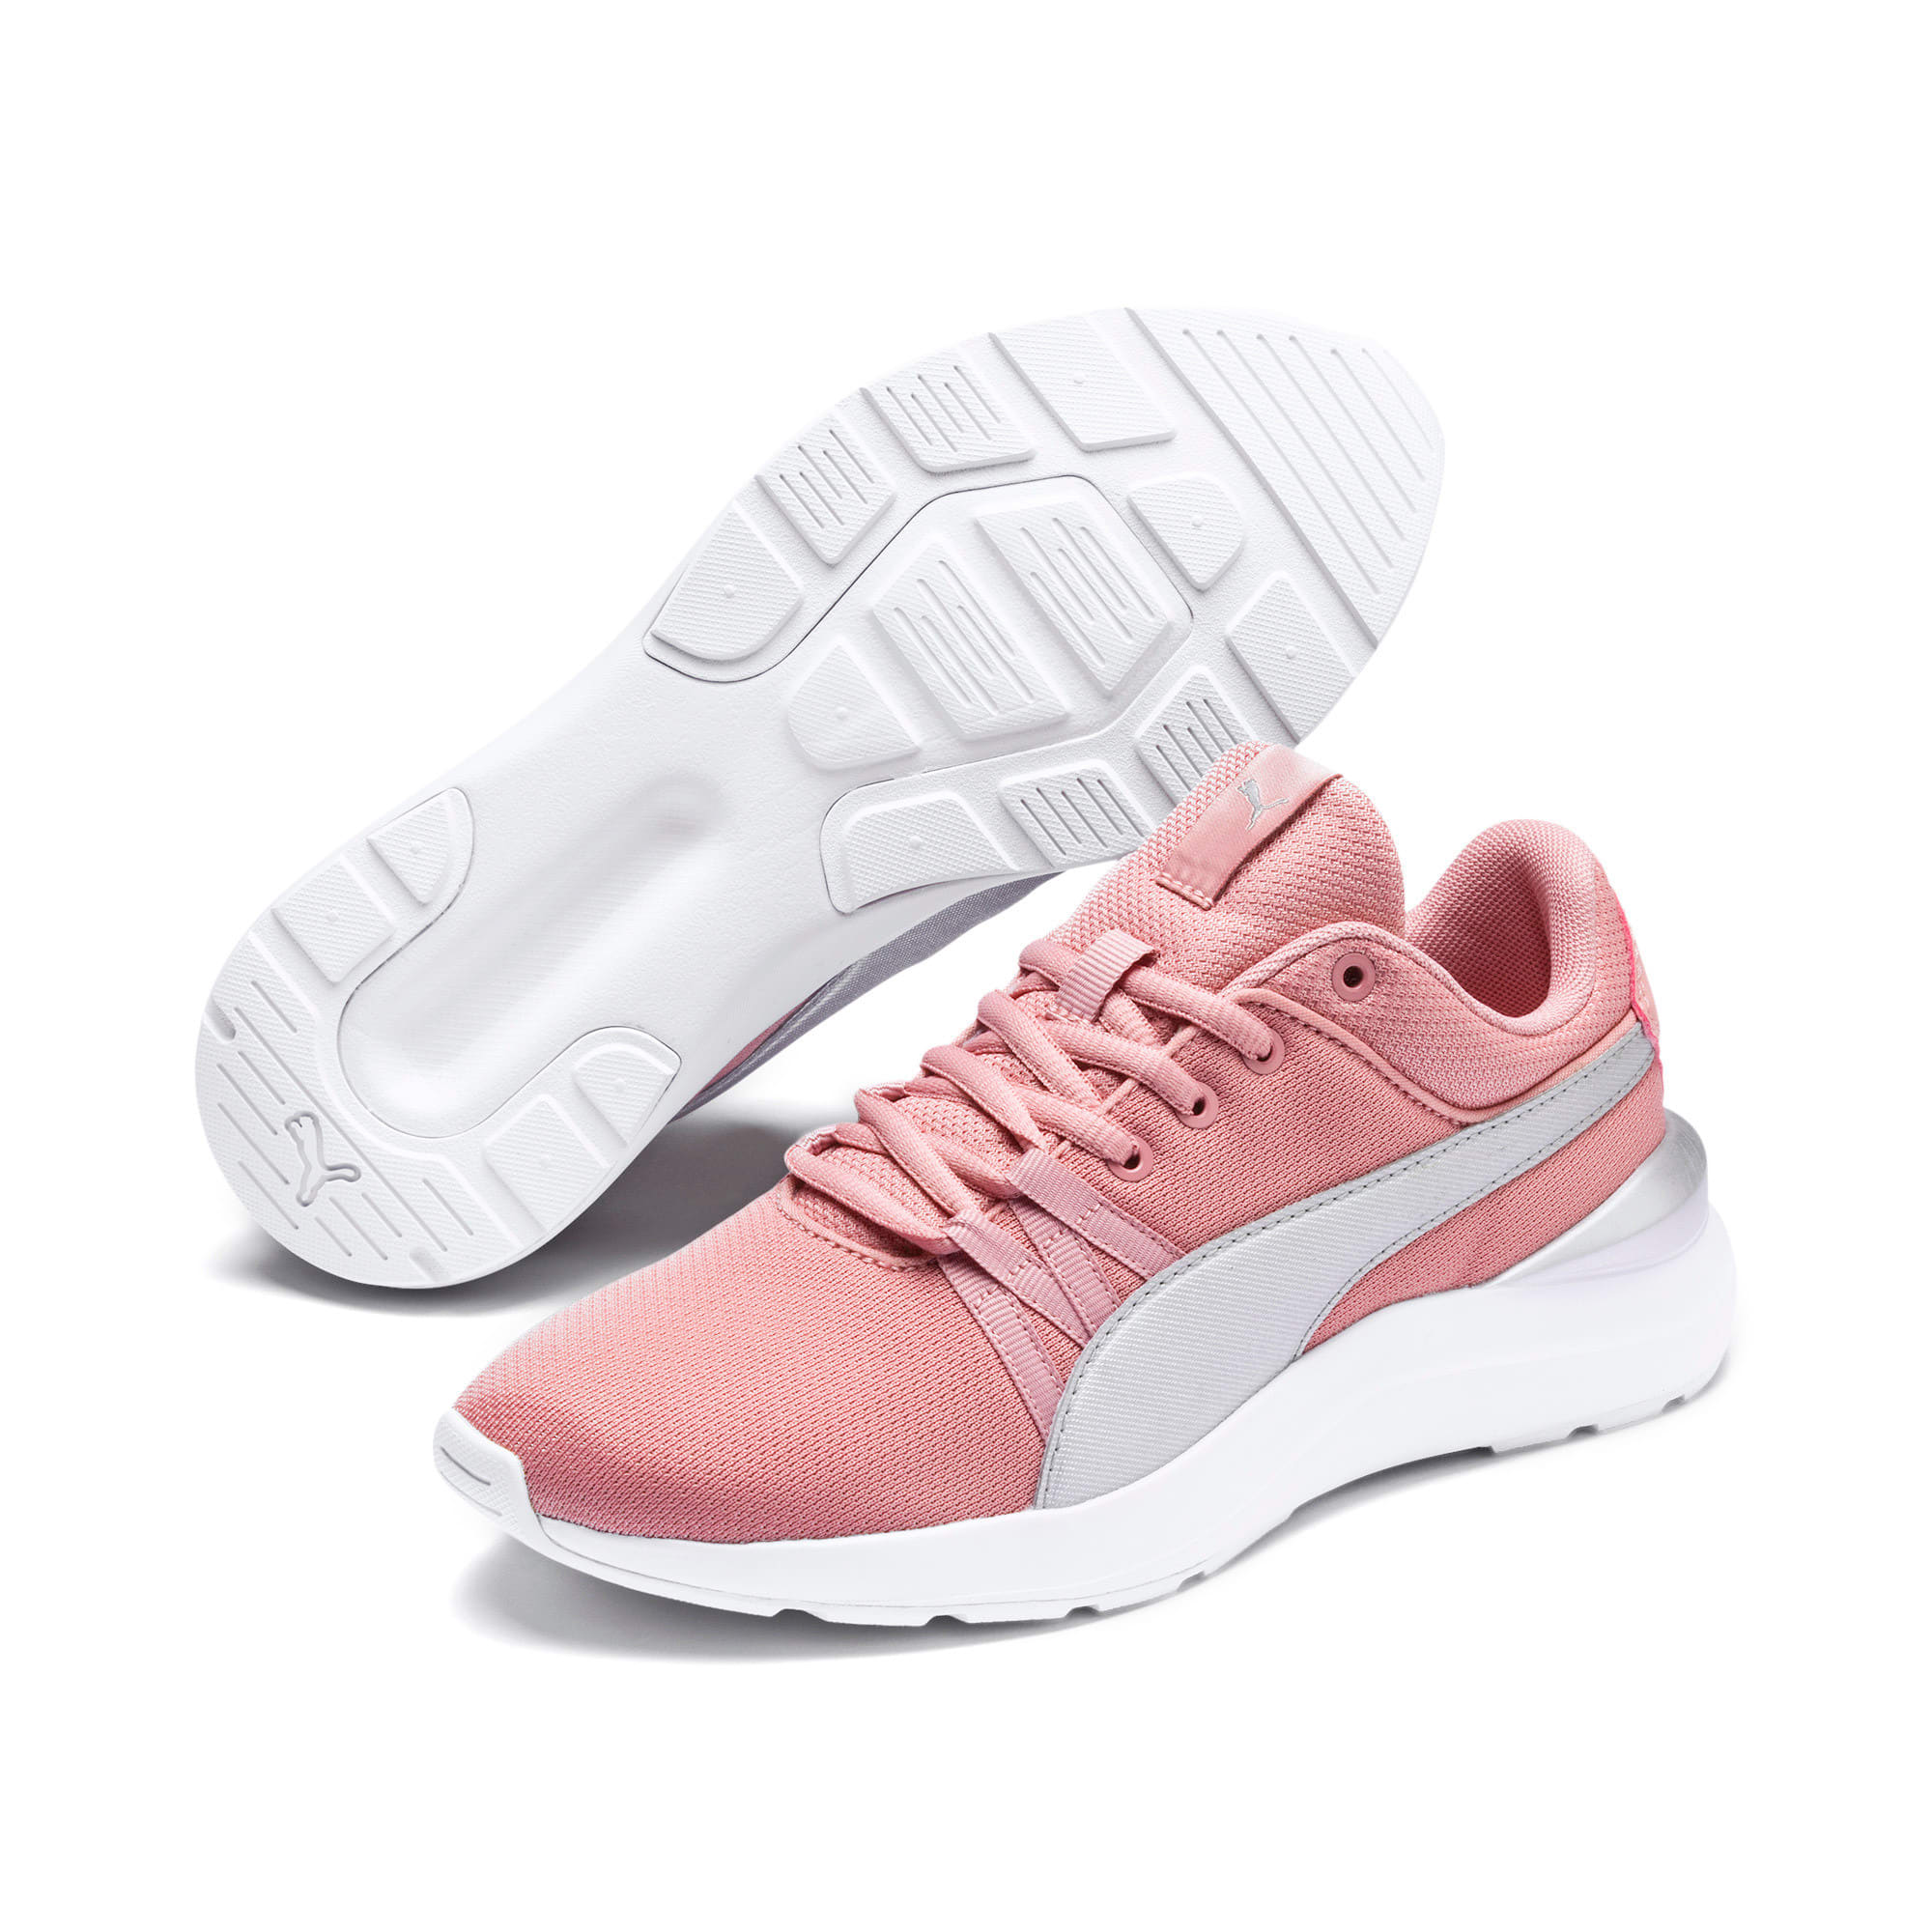 Thumbnail 2 of Adela Breathe Sneakers JR, Bridal Rose-Puma Silver, medium